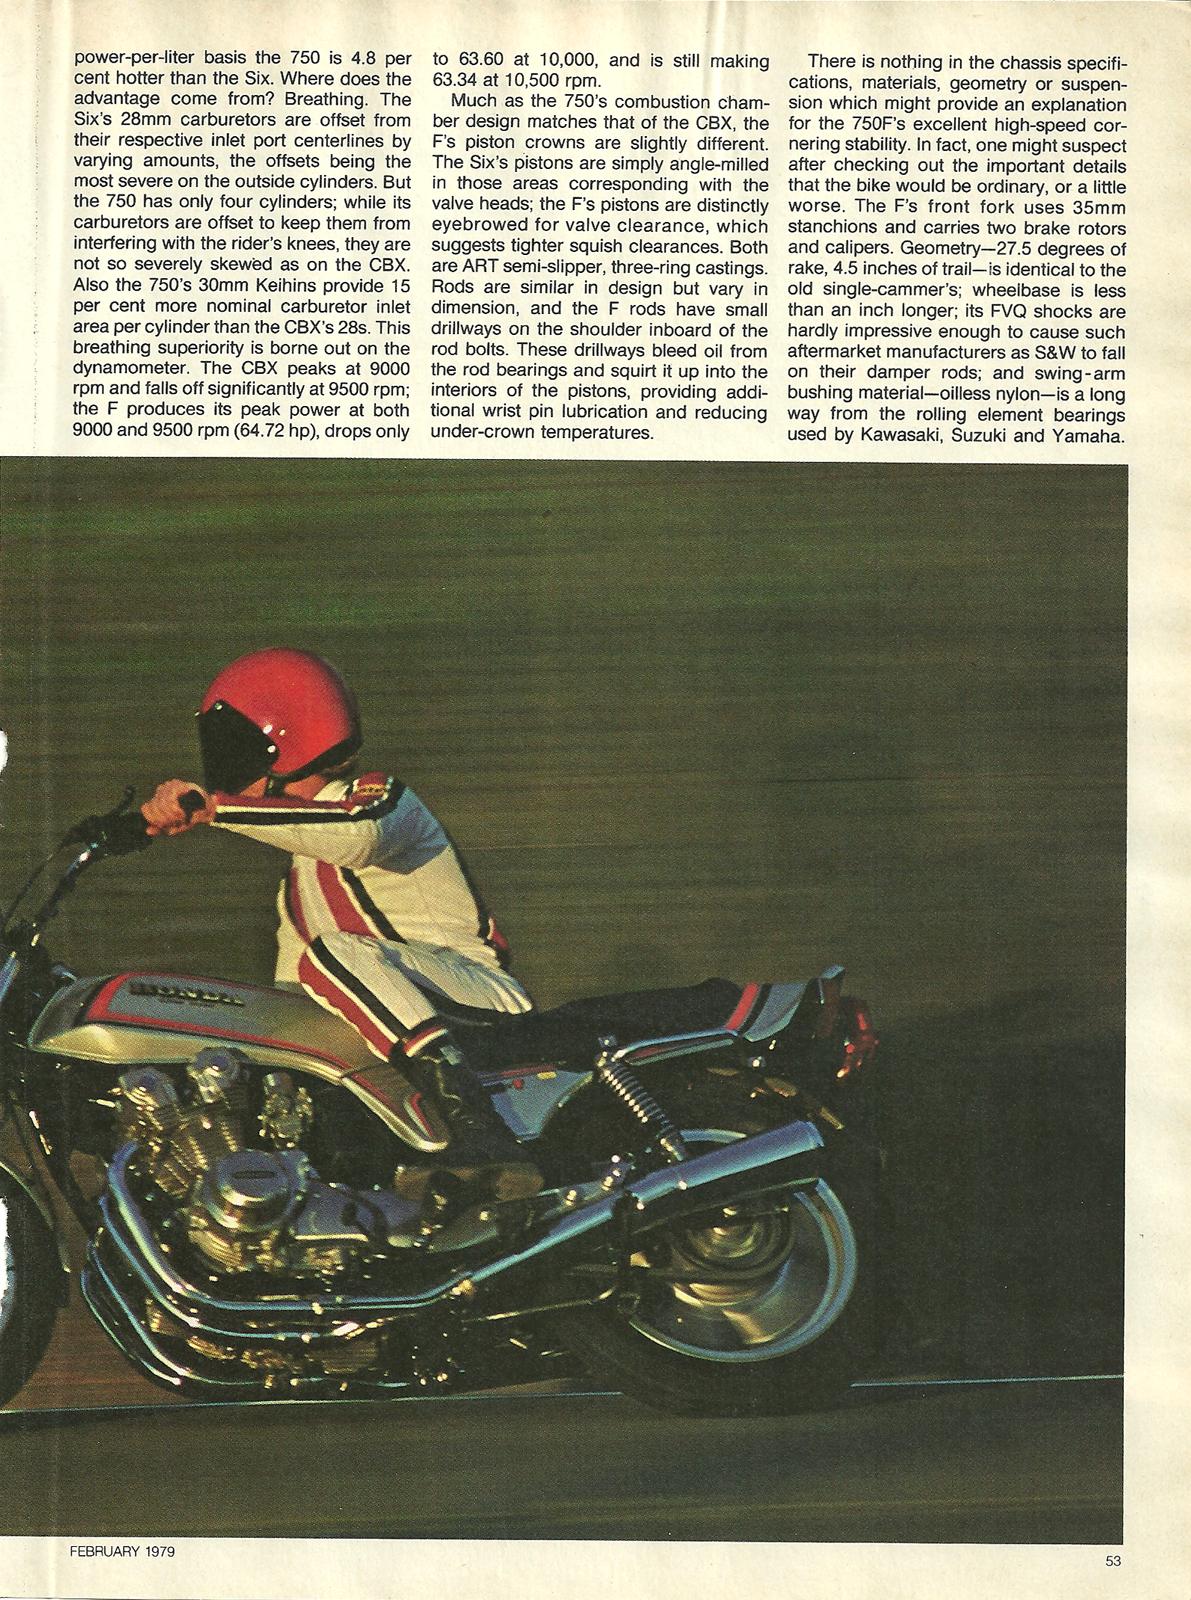 1979_Honda_CB750F_test_pg4.png